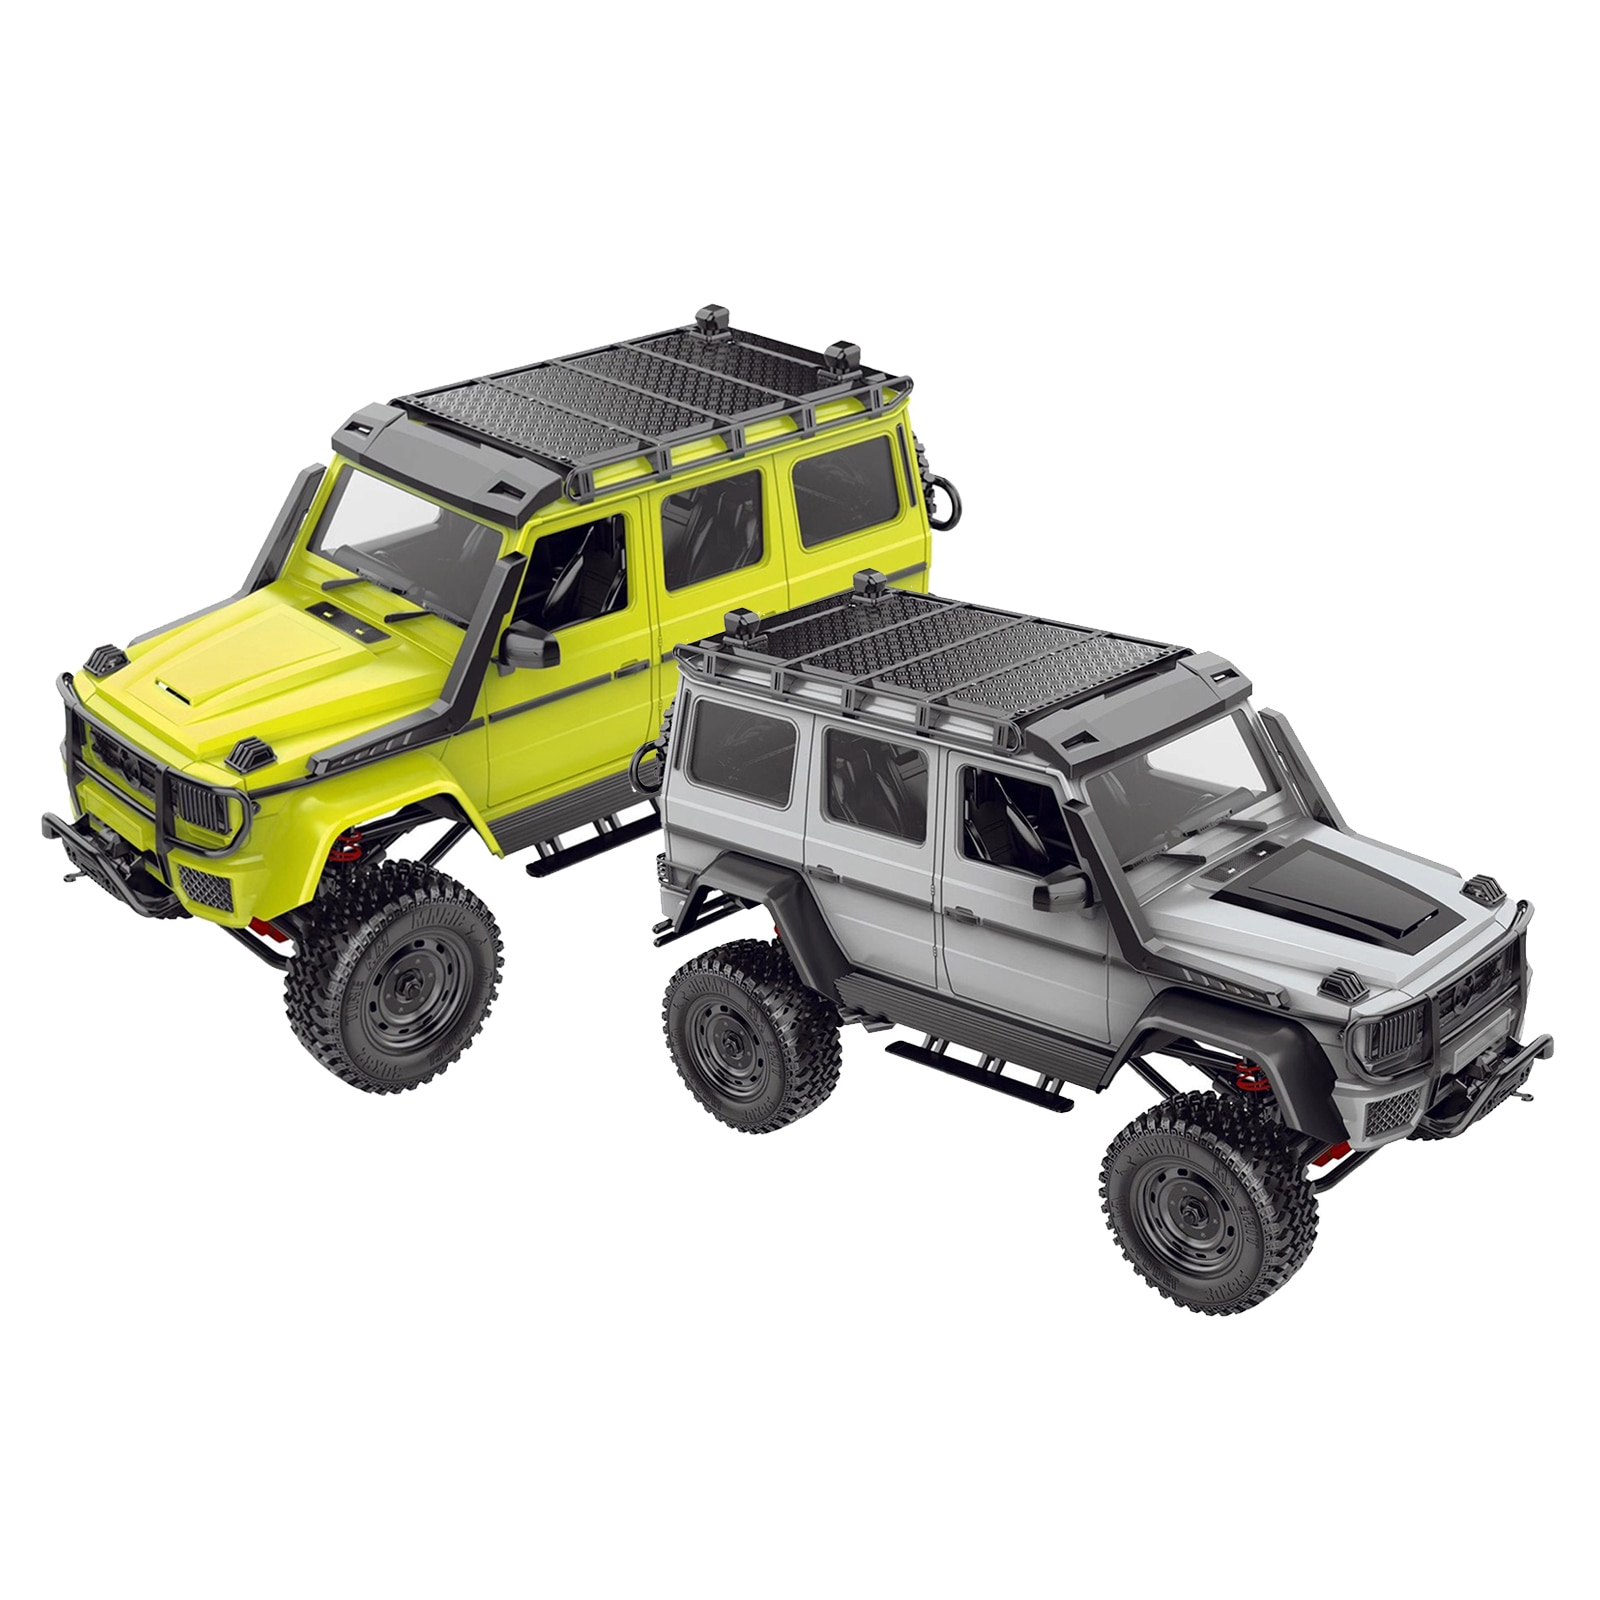 DIY MN86KS RC Rock Crawler 1:12 Scale  4WD Climbing Car Upgrade Kit enlarge